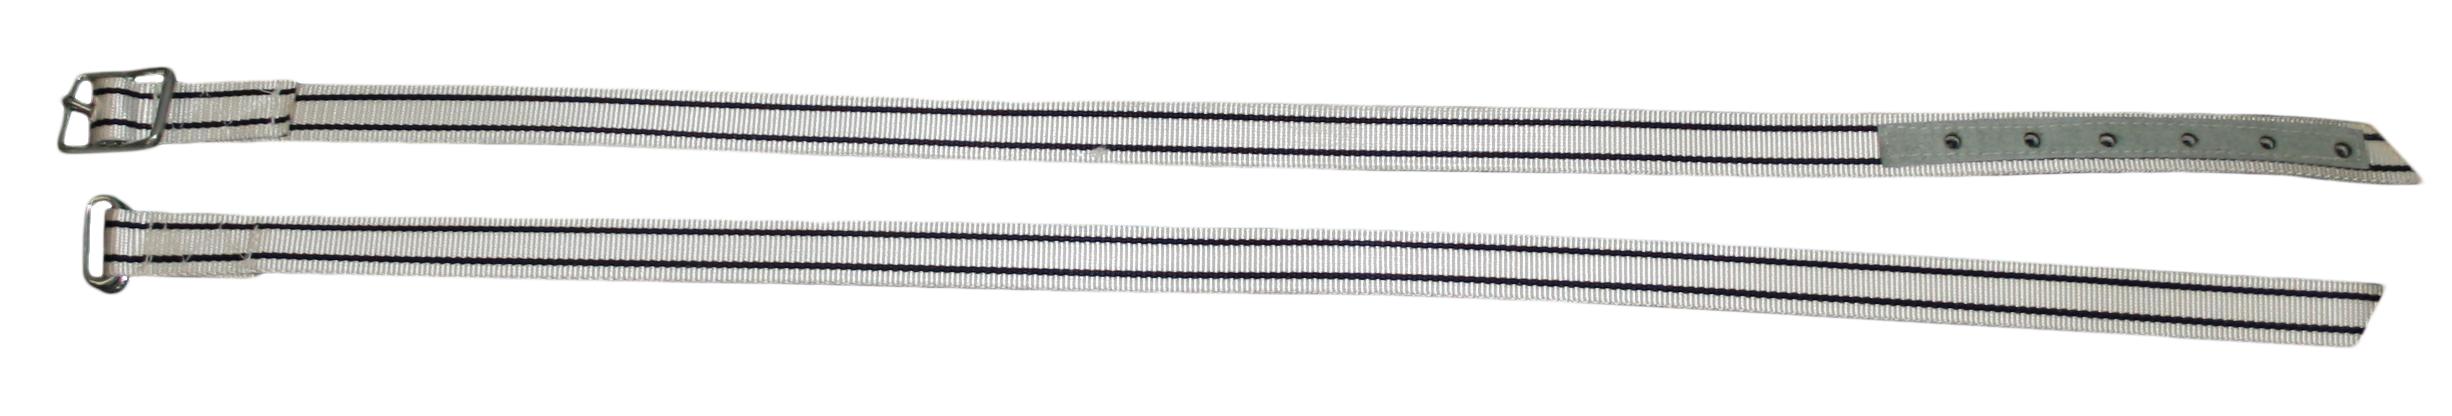 Koeriem nylon 110 cm met tonggesp